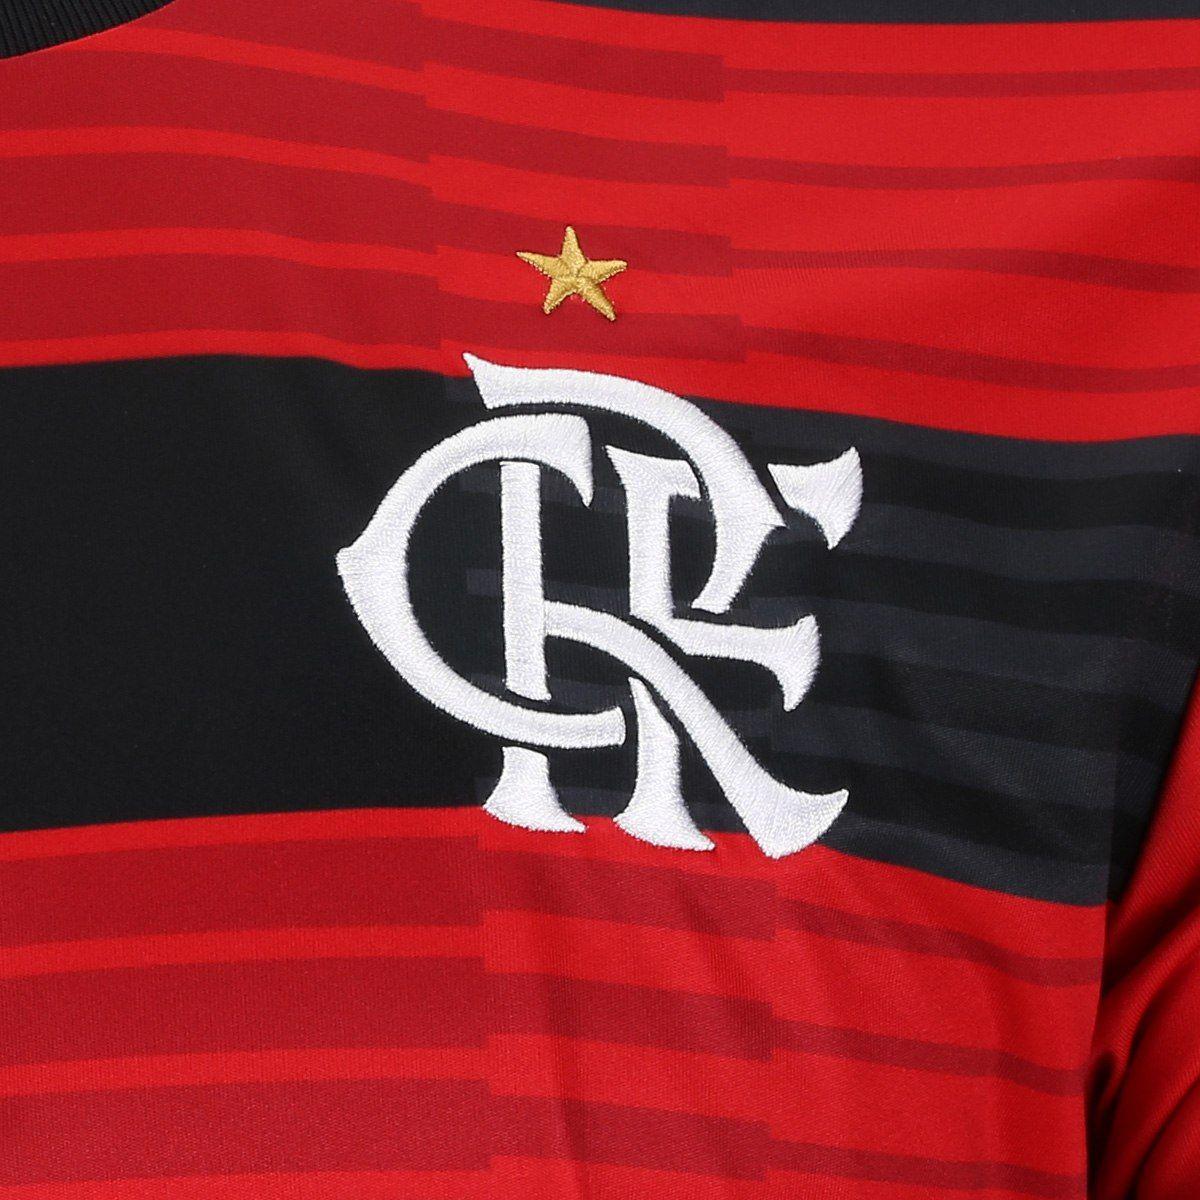 Camisa Flamengo I 2018 s n° Torcedor Adidas Masculina - Vermelho e Preto a9d788c4fb3